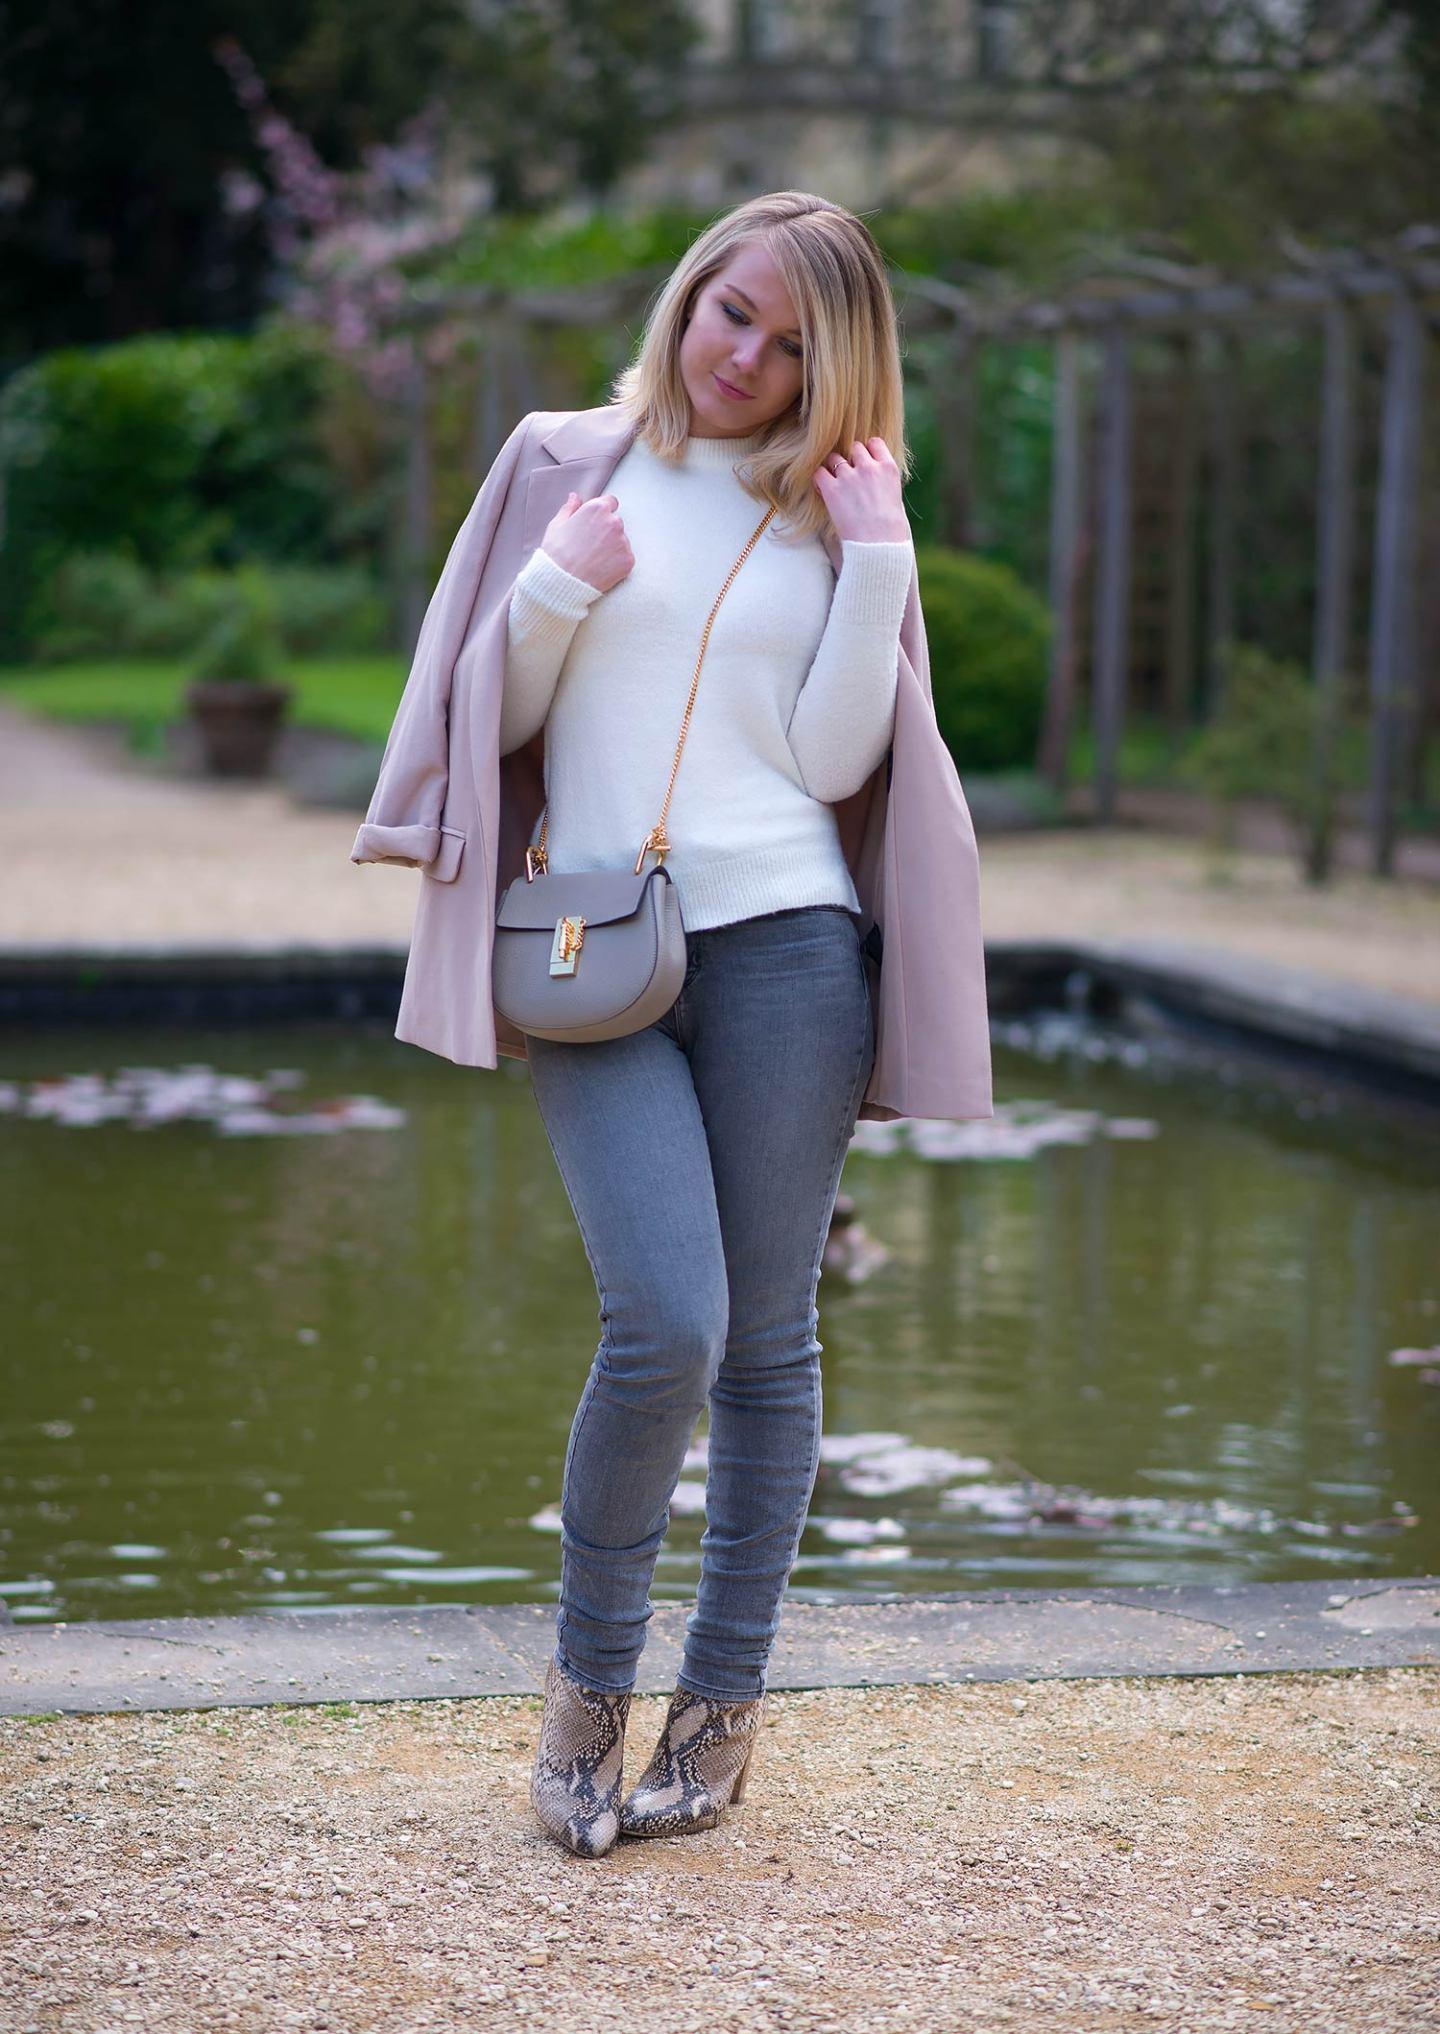 lorna-burford-uk-fashion-blogger-blush-pink-jacket